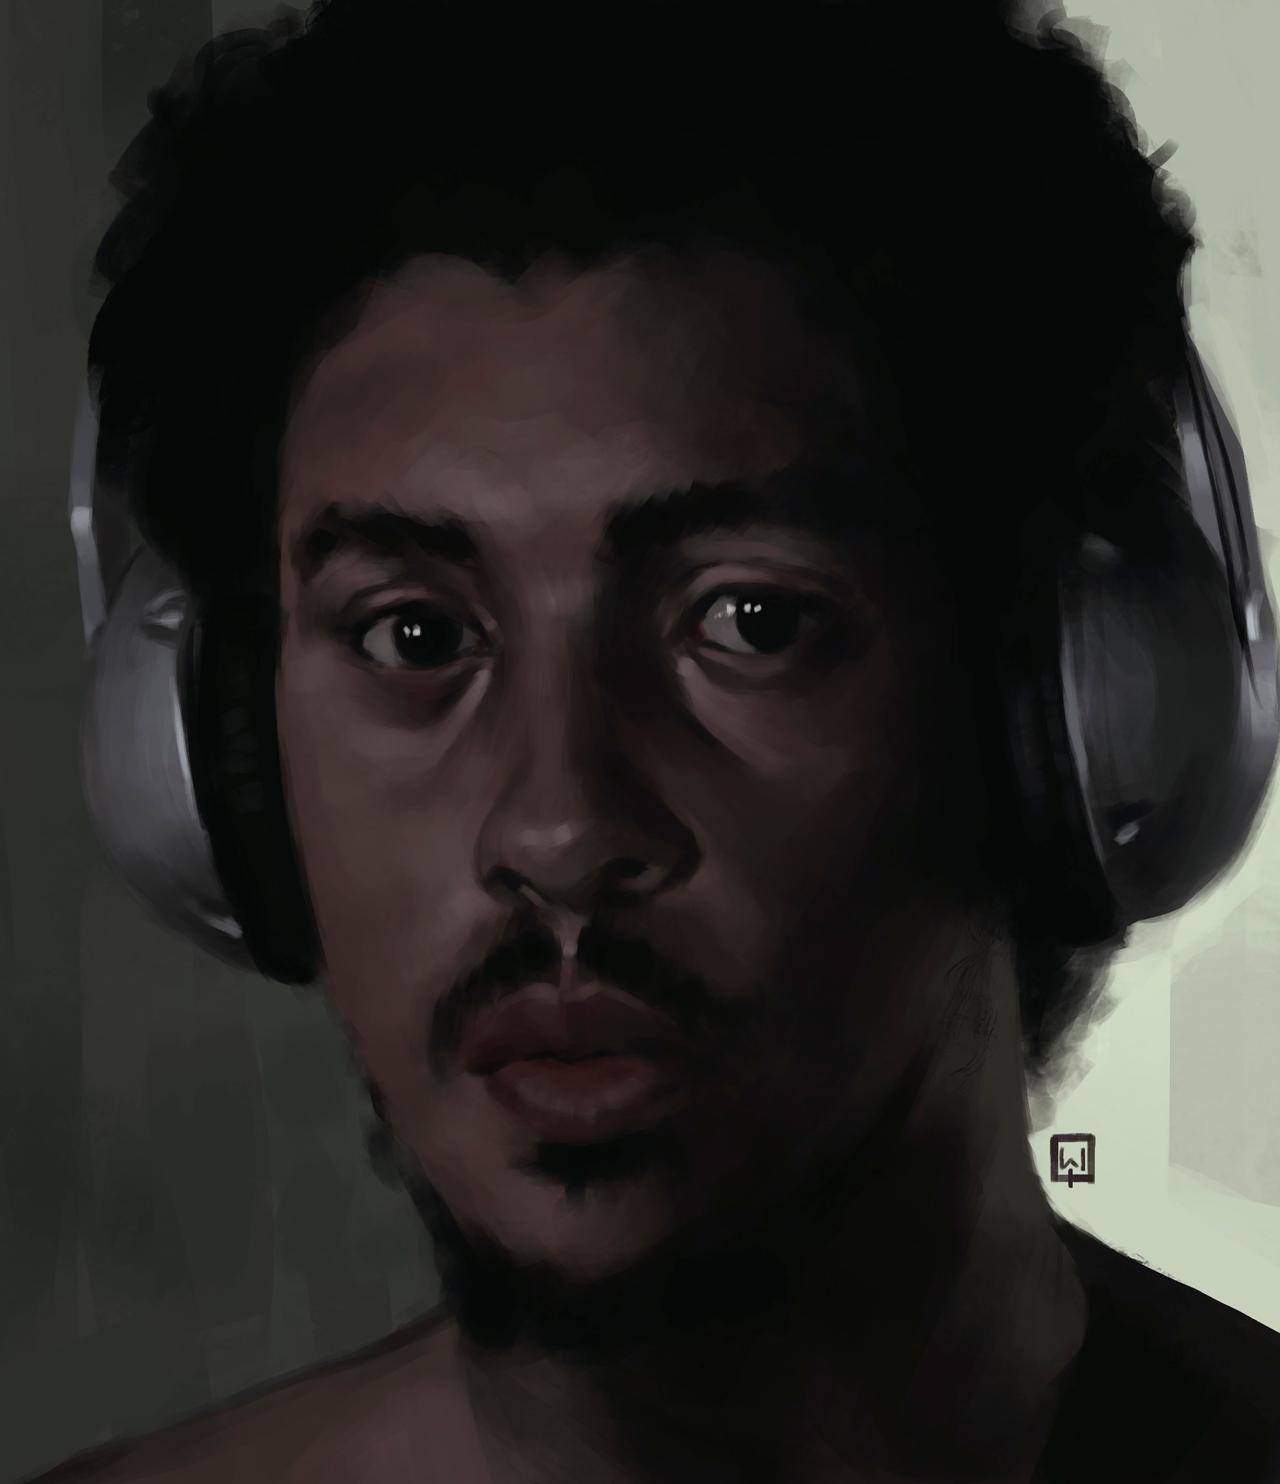 MonkeyMan-ArtWork's Profile Picture